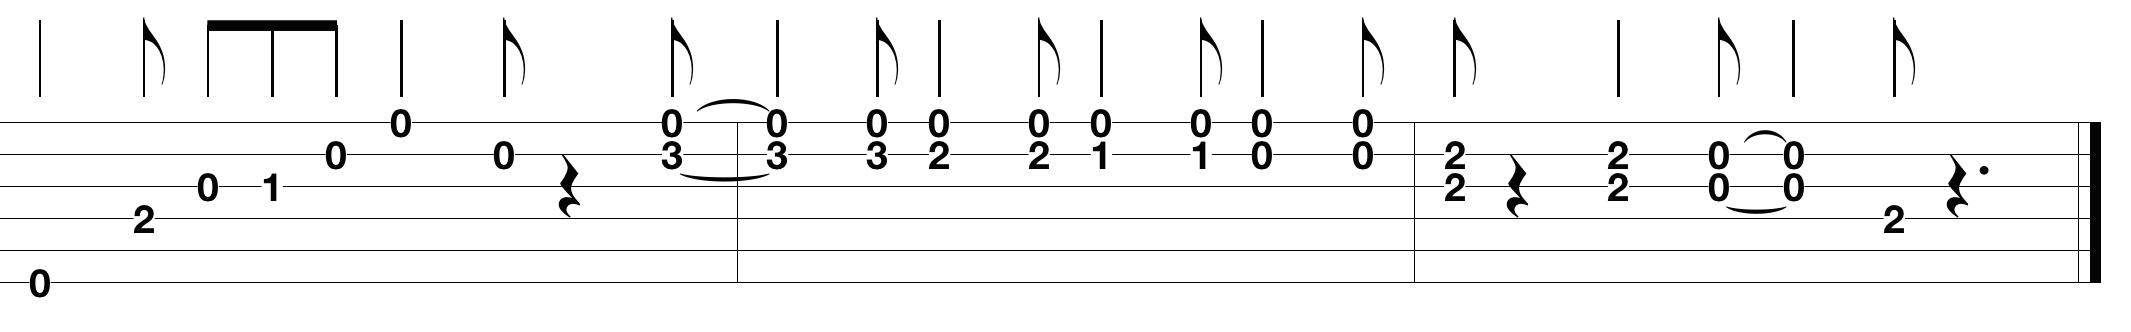 online-blues-guitar-lessons_3.png